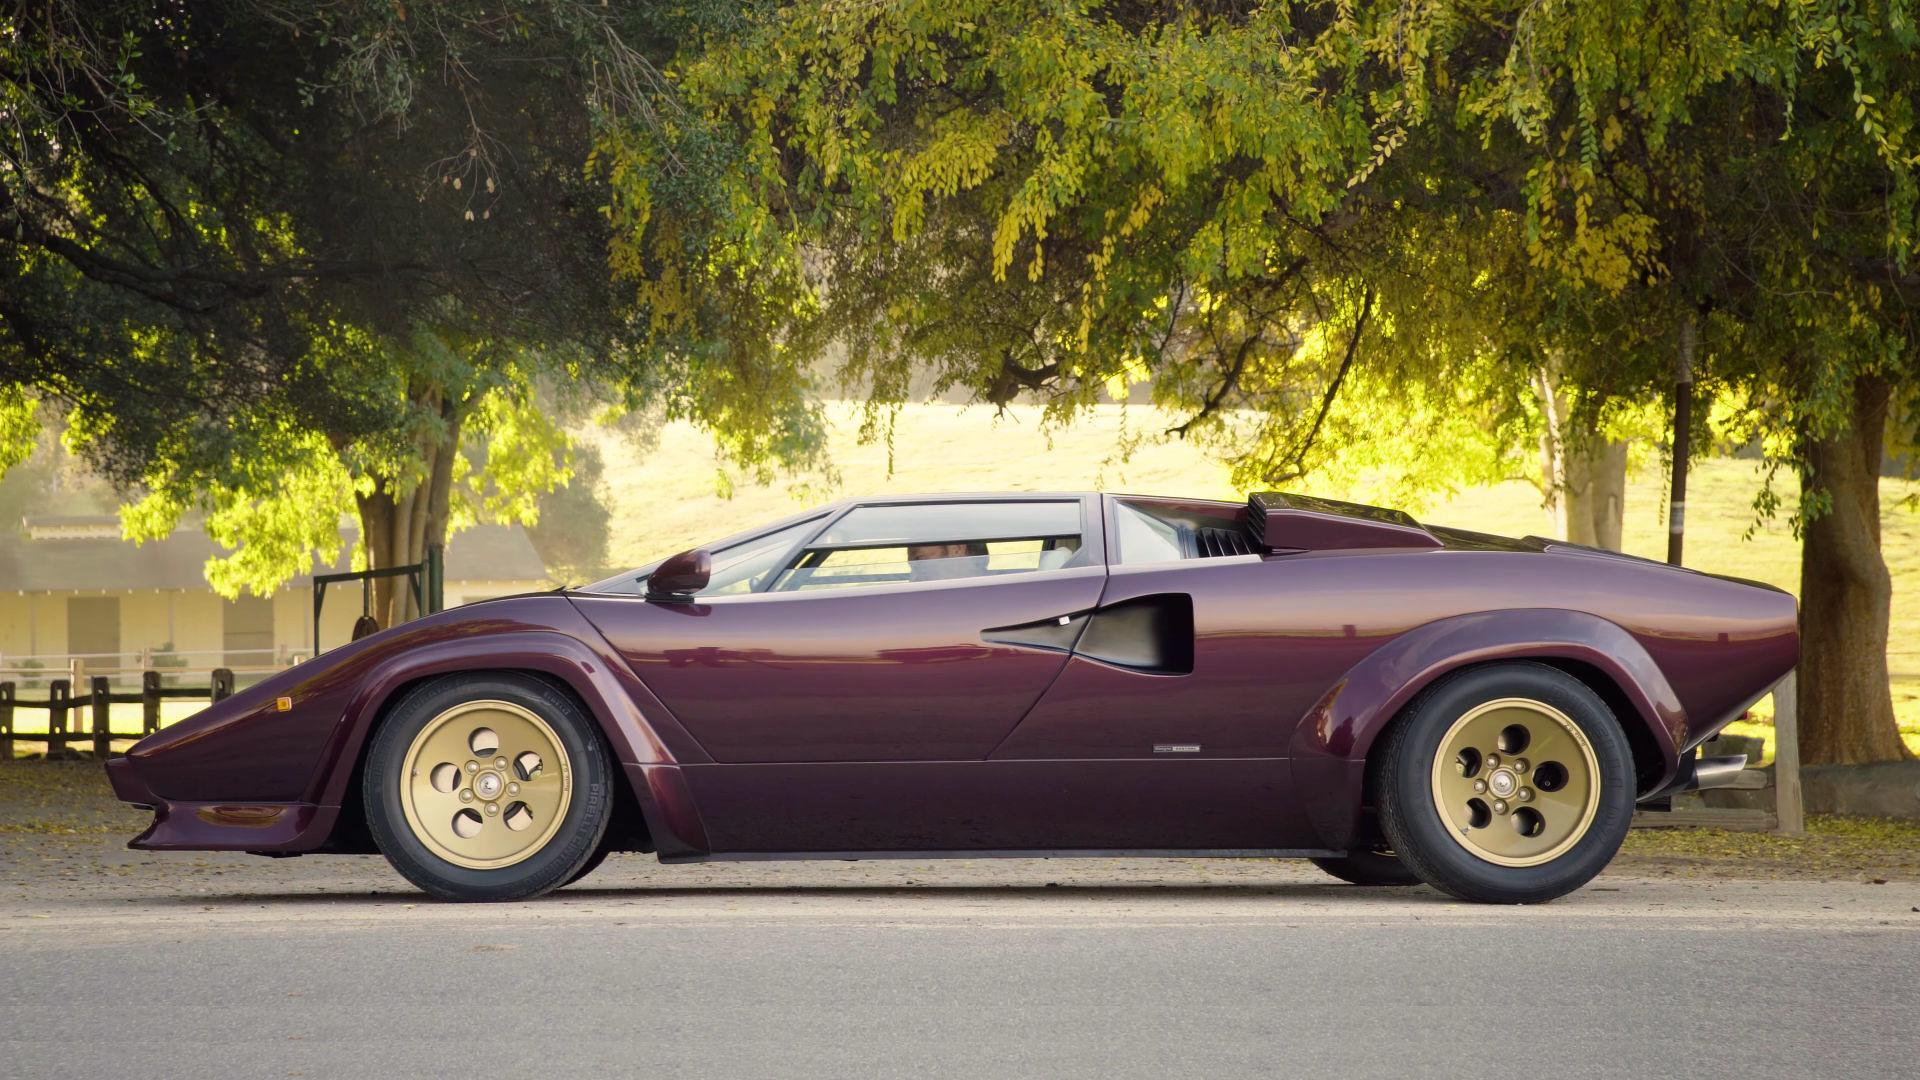 Countach Inspired Wheels Give Lamborghini Huracan Retro Makeover